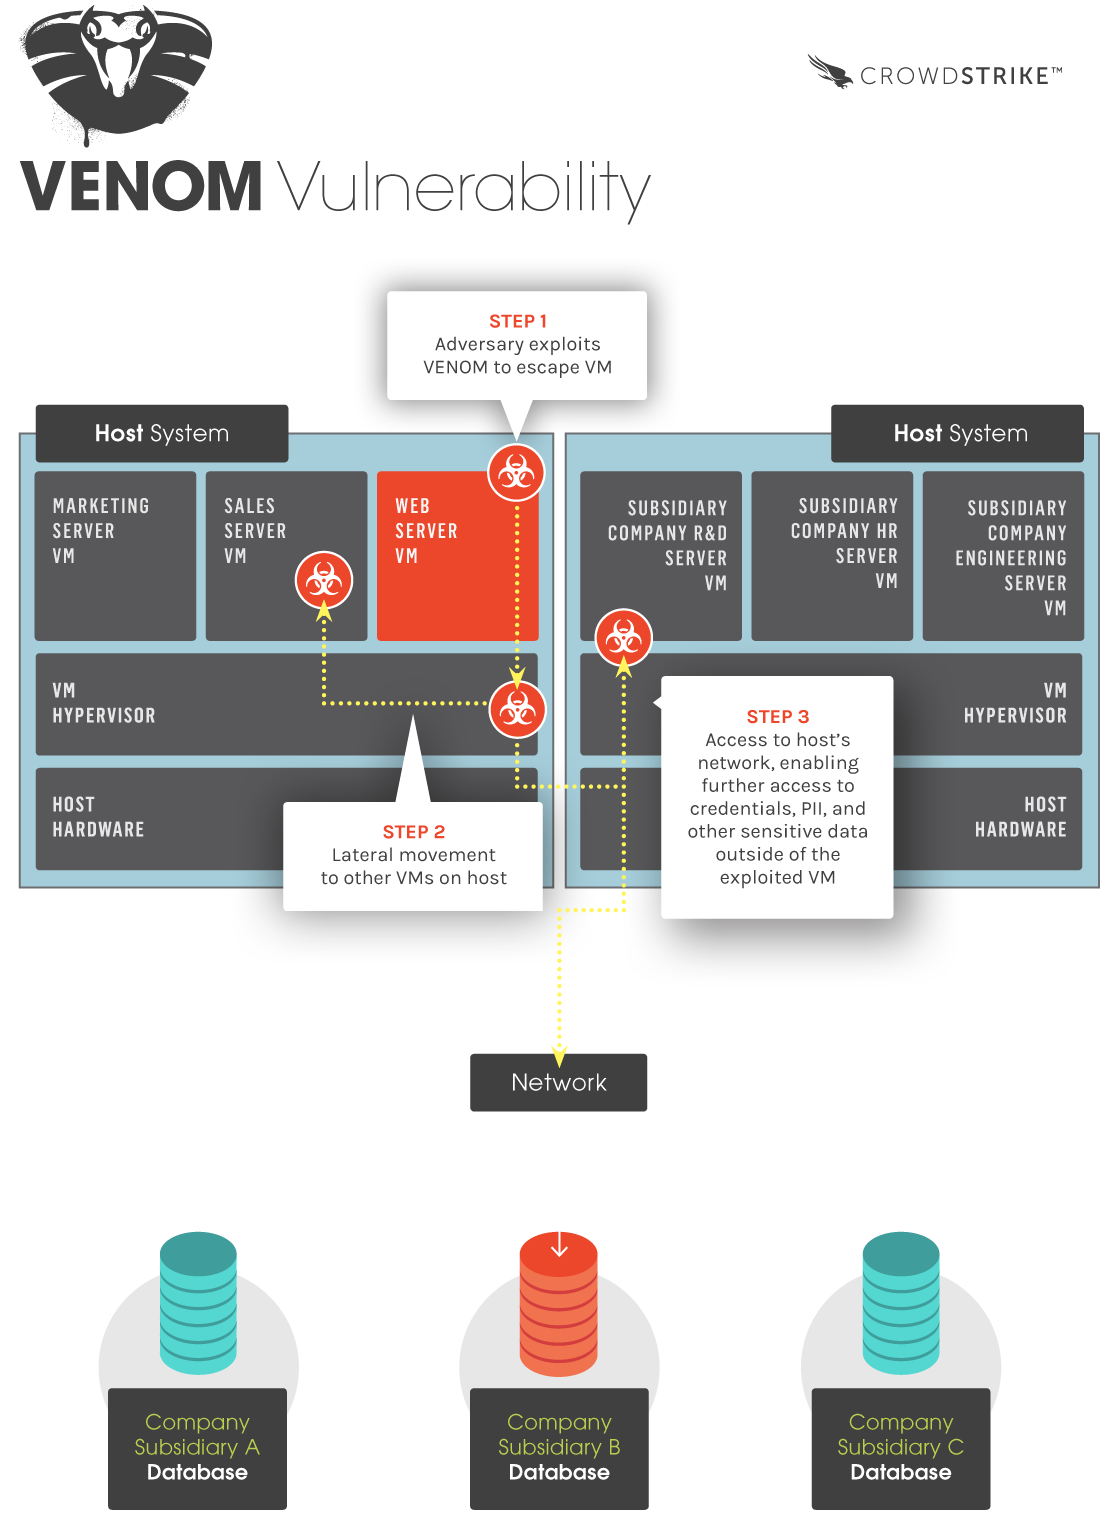 Cloud IaaS & CVE-2015-3456 (VENOM) Security Vulnerability